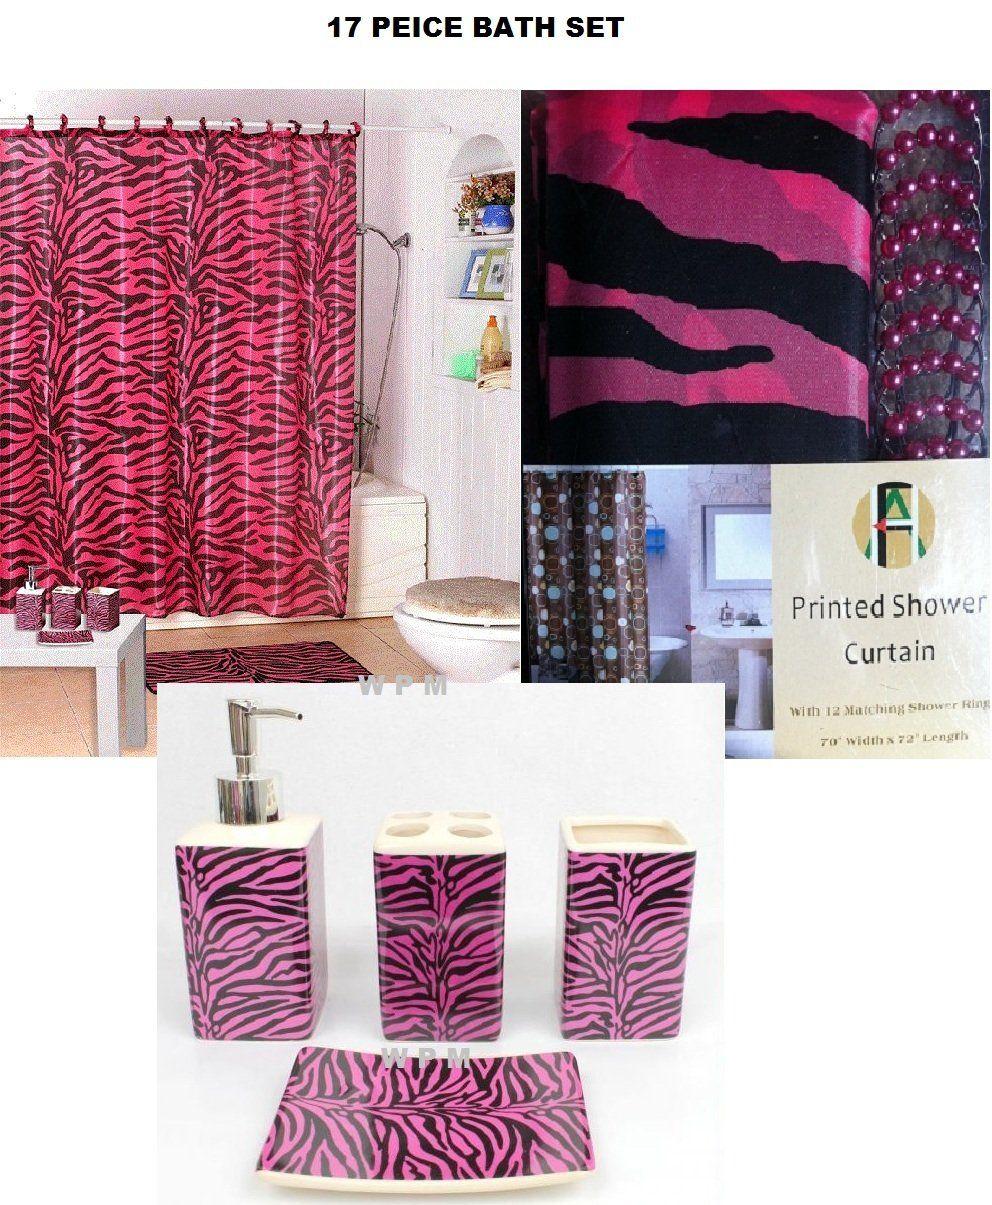 Cheetah Bathroom Set Beautiful Animal Print For Bathroom Home Interiors In 2020 Zebra Bathroom Decor Black Shower Curtains Zebra Print Bathroom Pink zebra bathroom decor